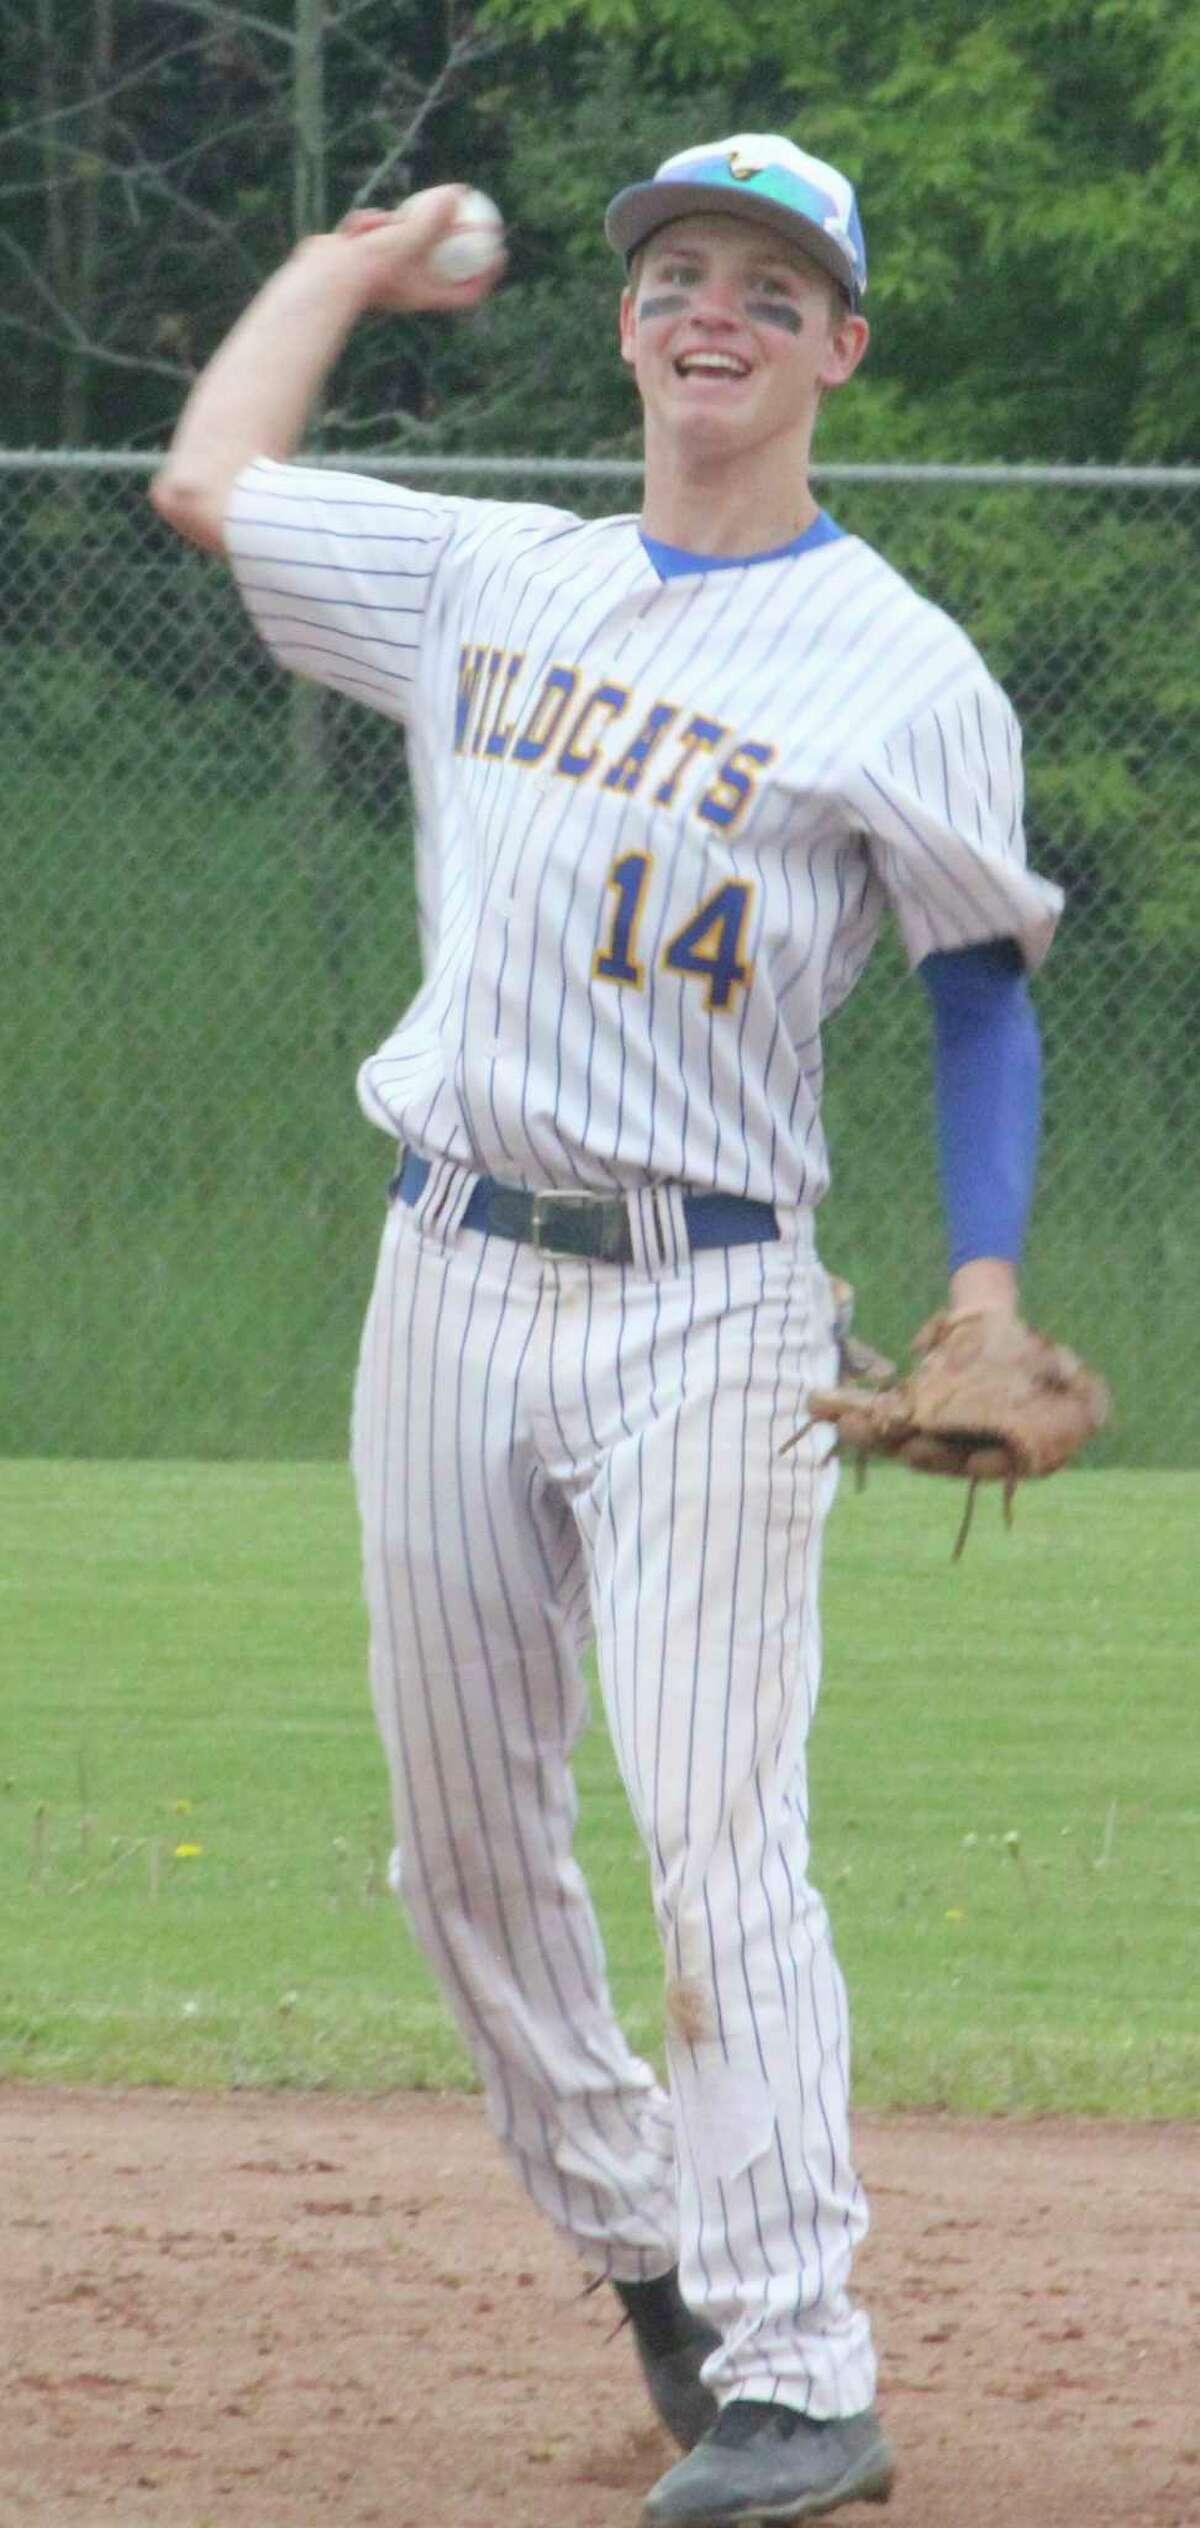 Danny Witbeck has had a strong senior season for Evart's baseball team. (Herald Review/John Raffel)